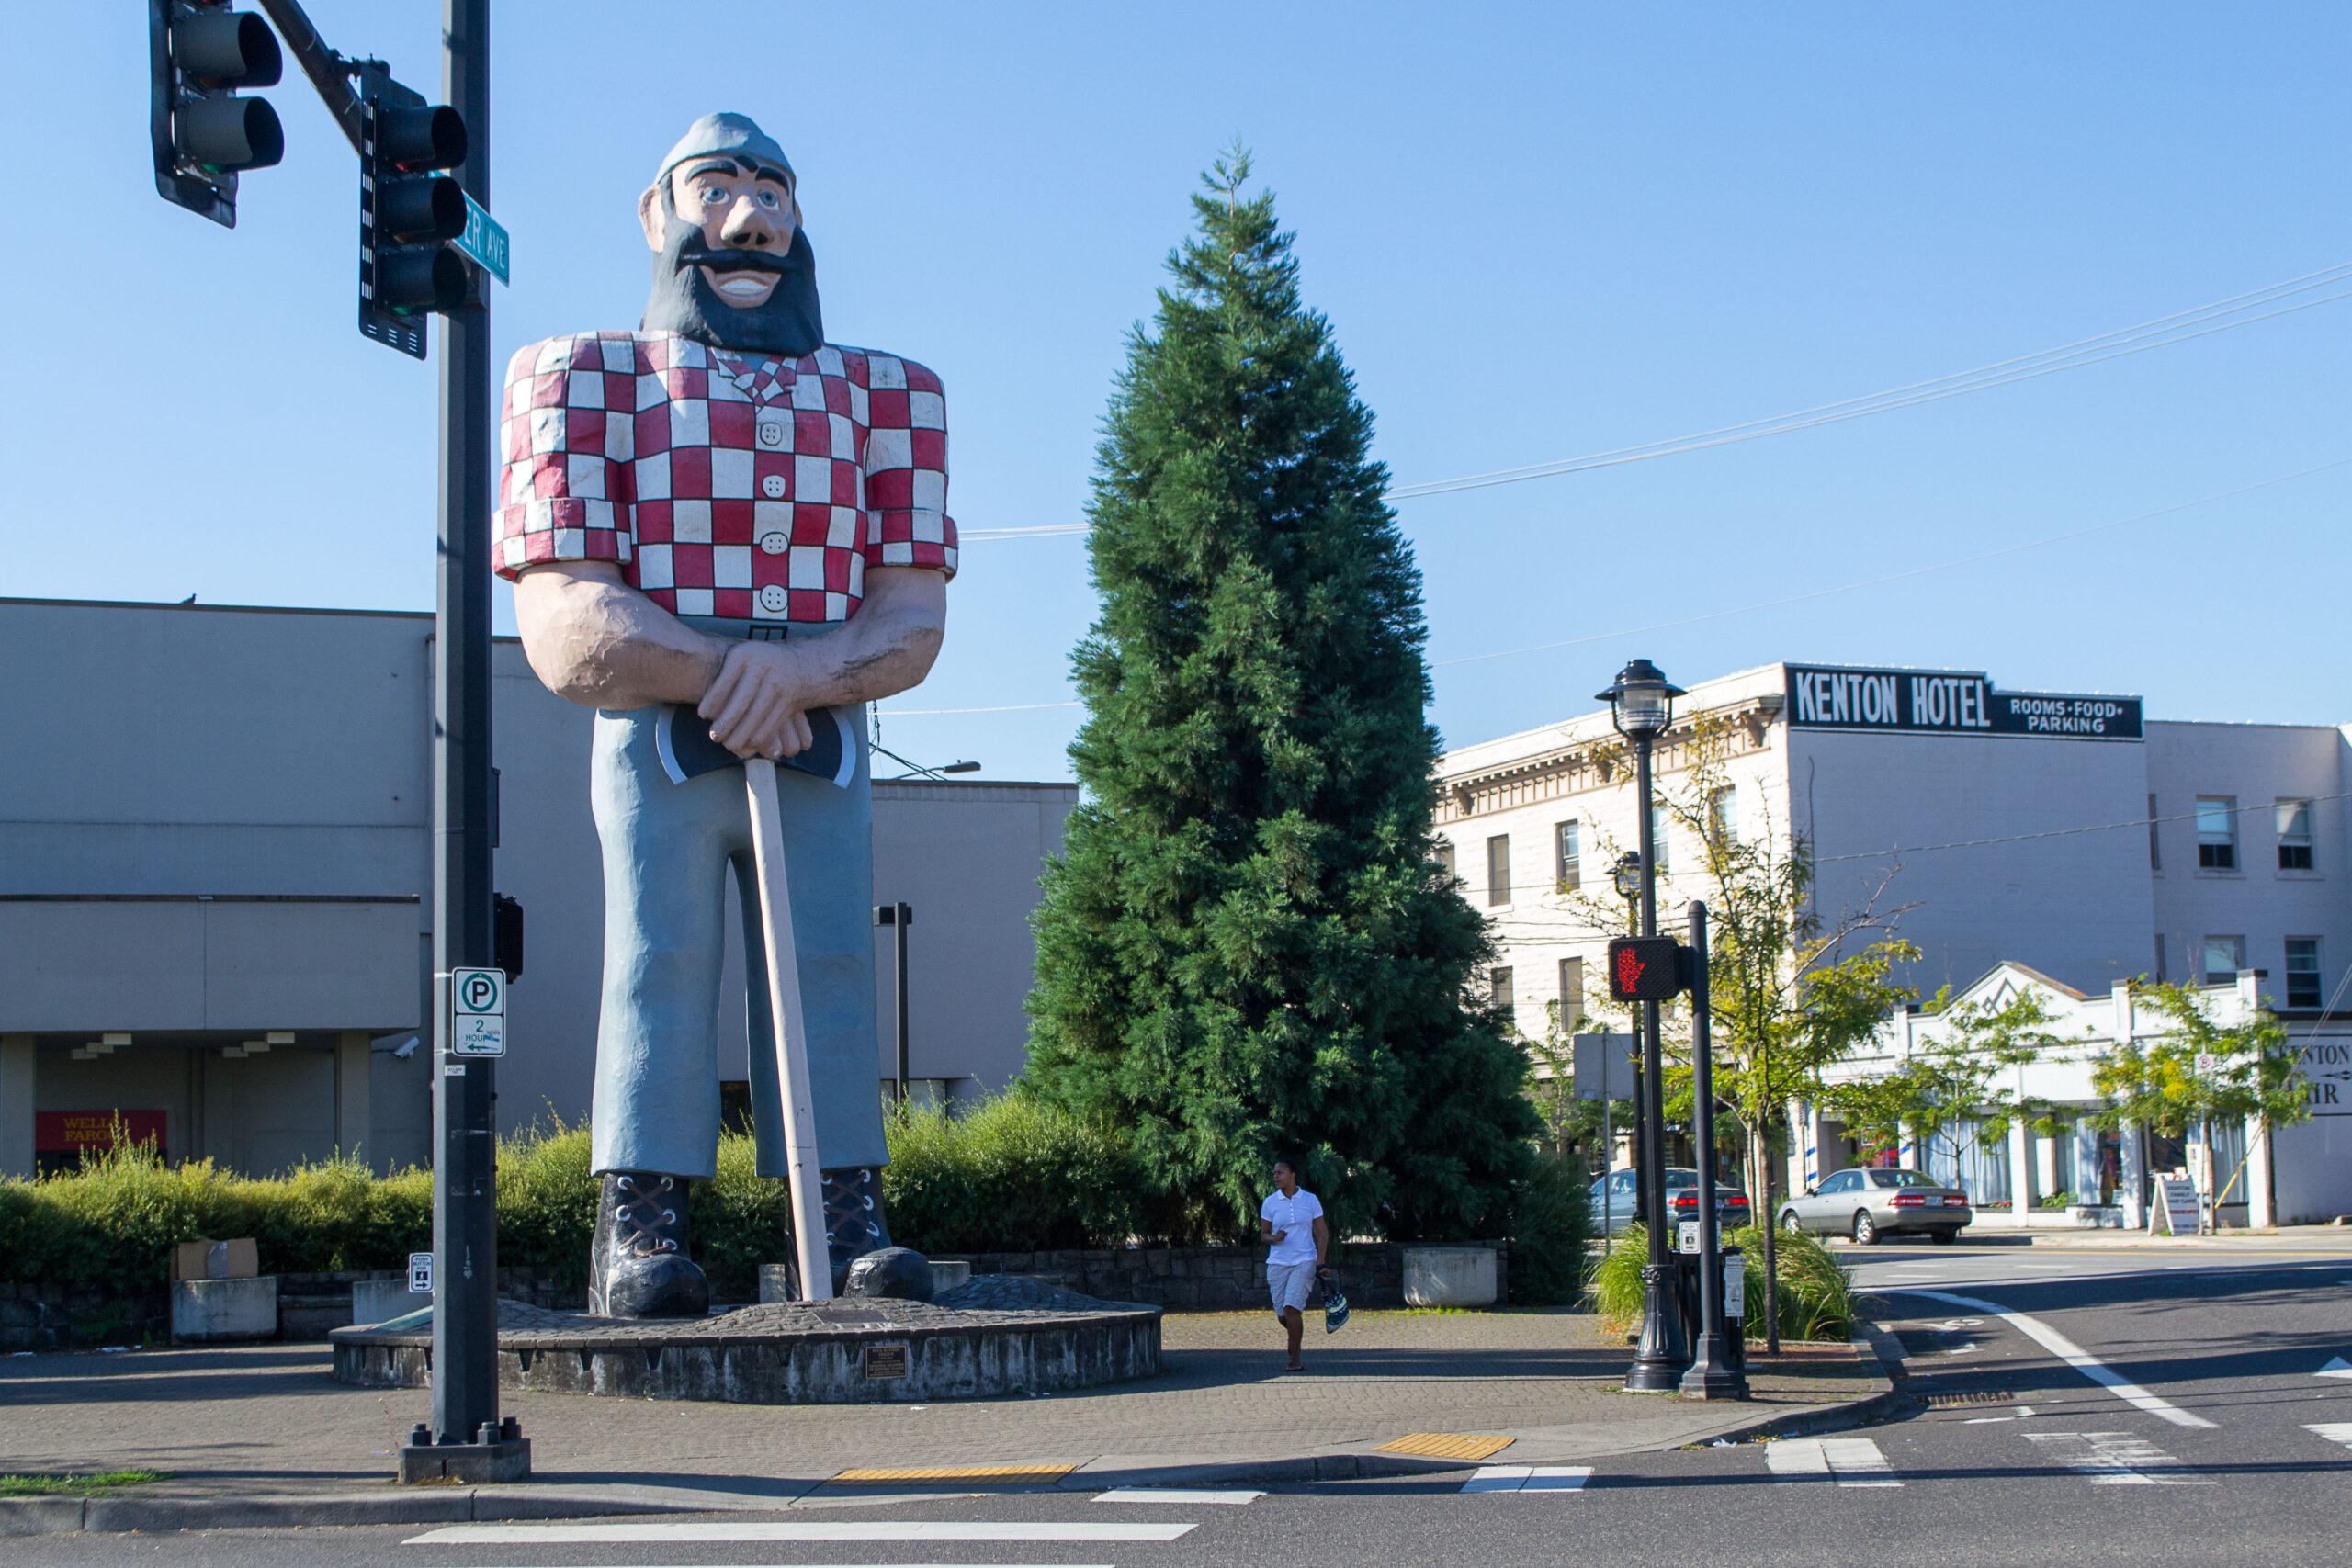 Statue of a lumberjack